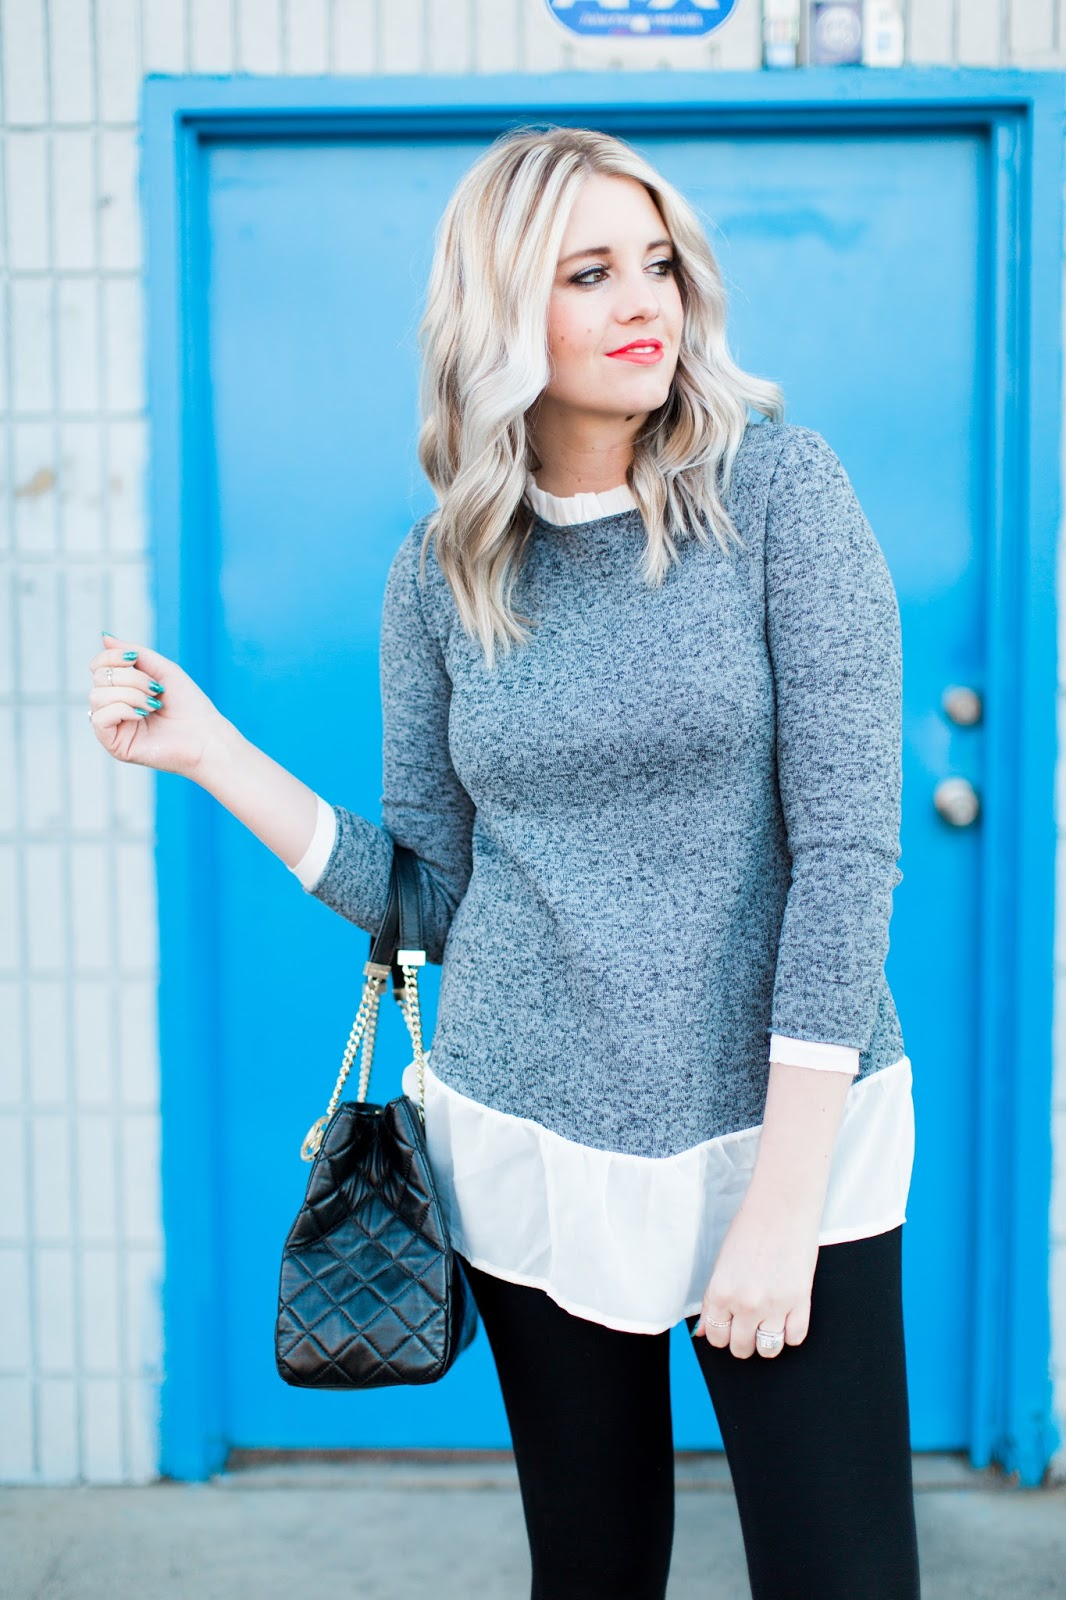 Ruffle Sweater, Modest Outfit, Utah Fashion Blogger